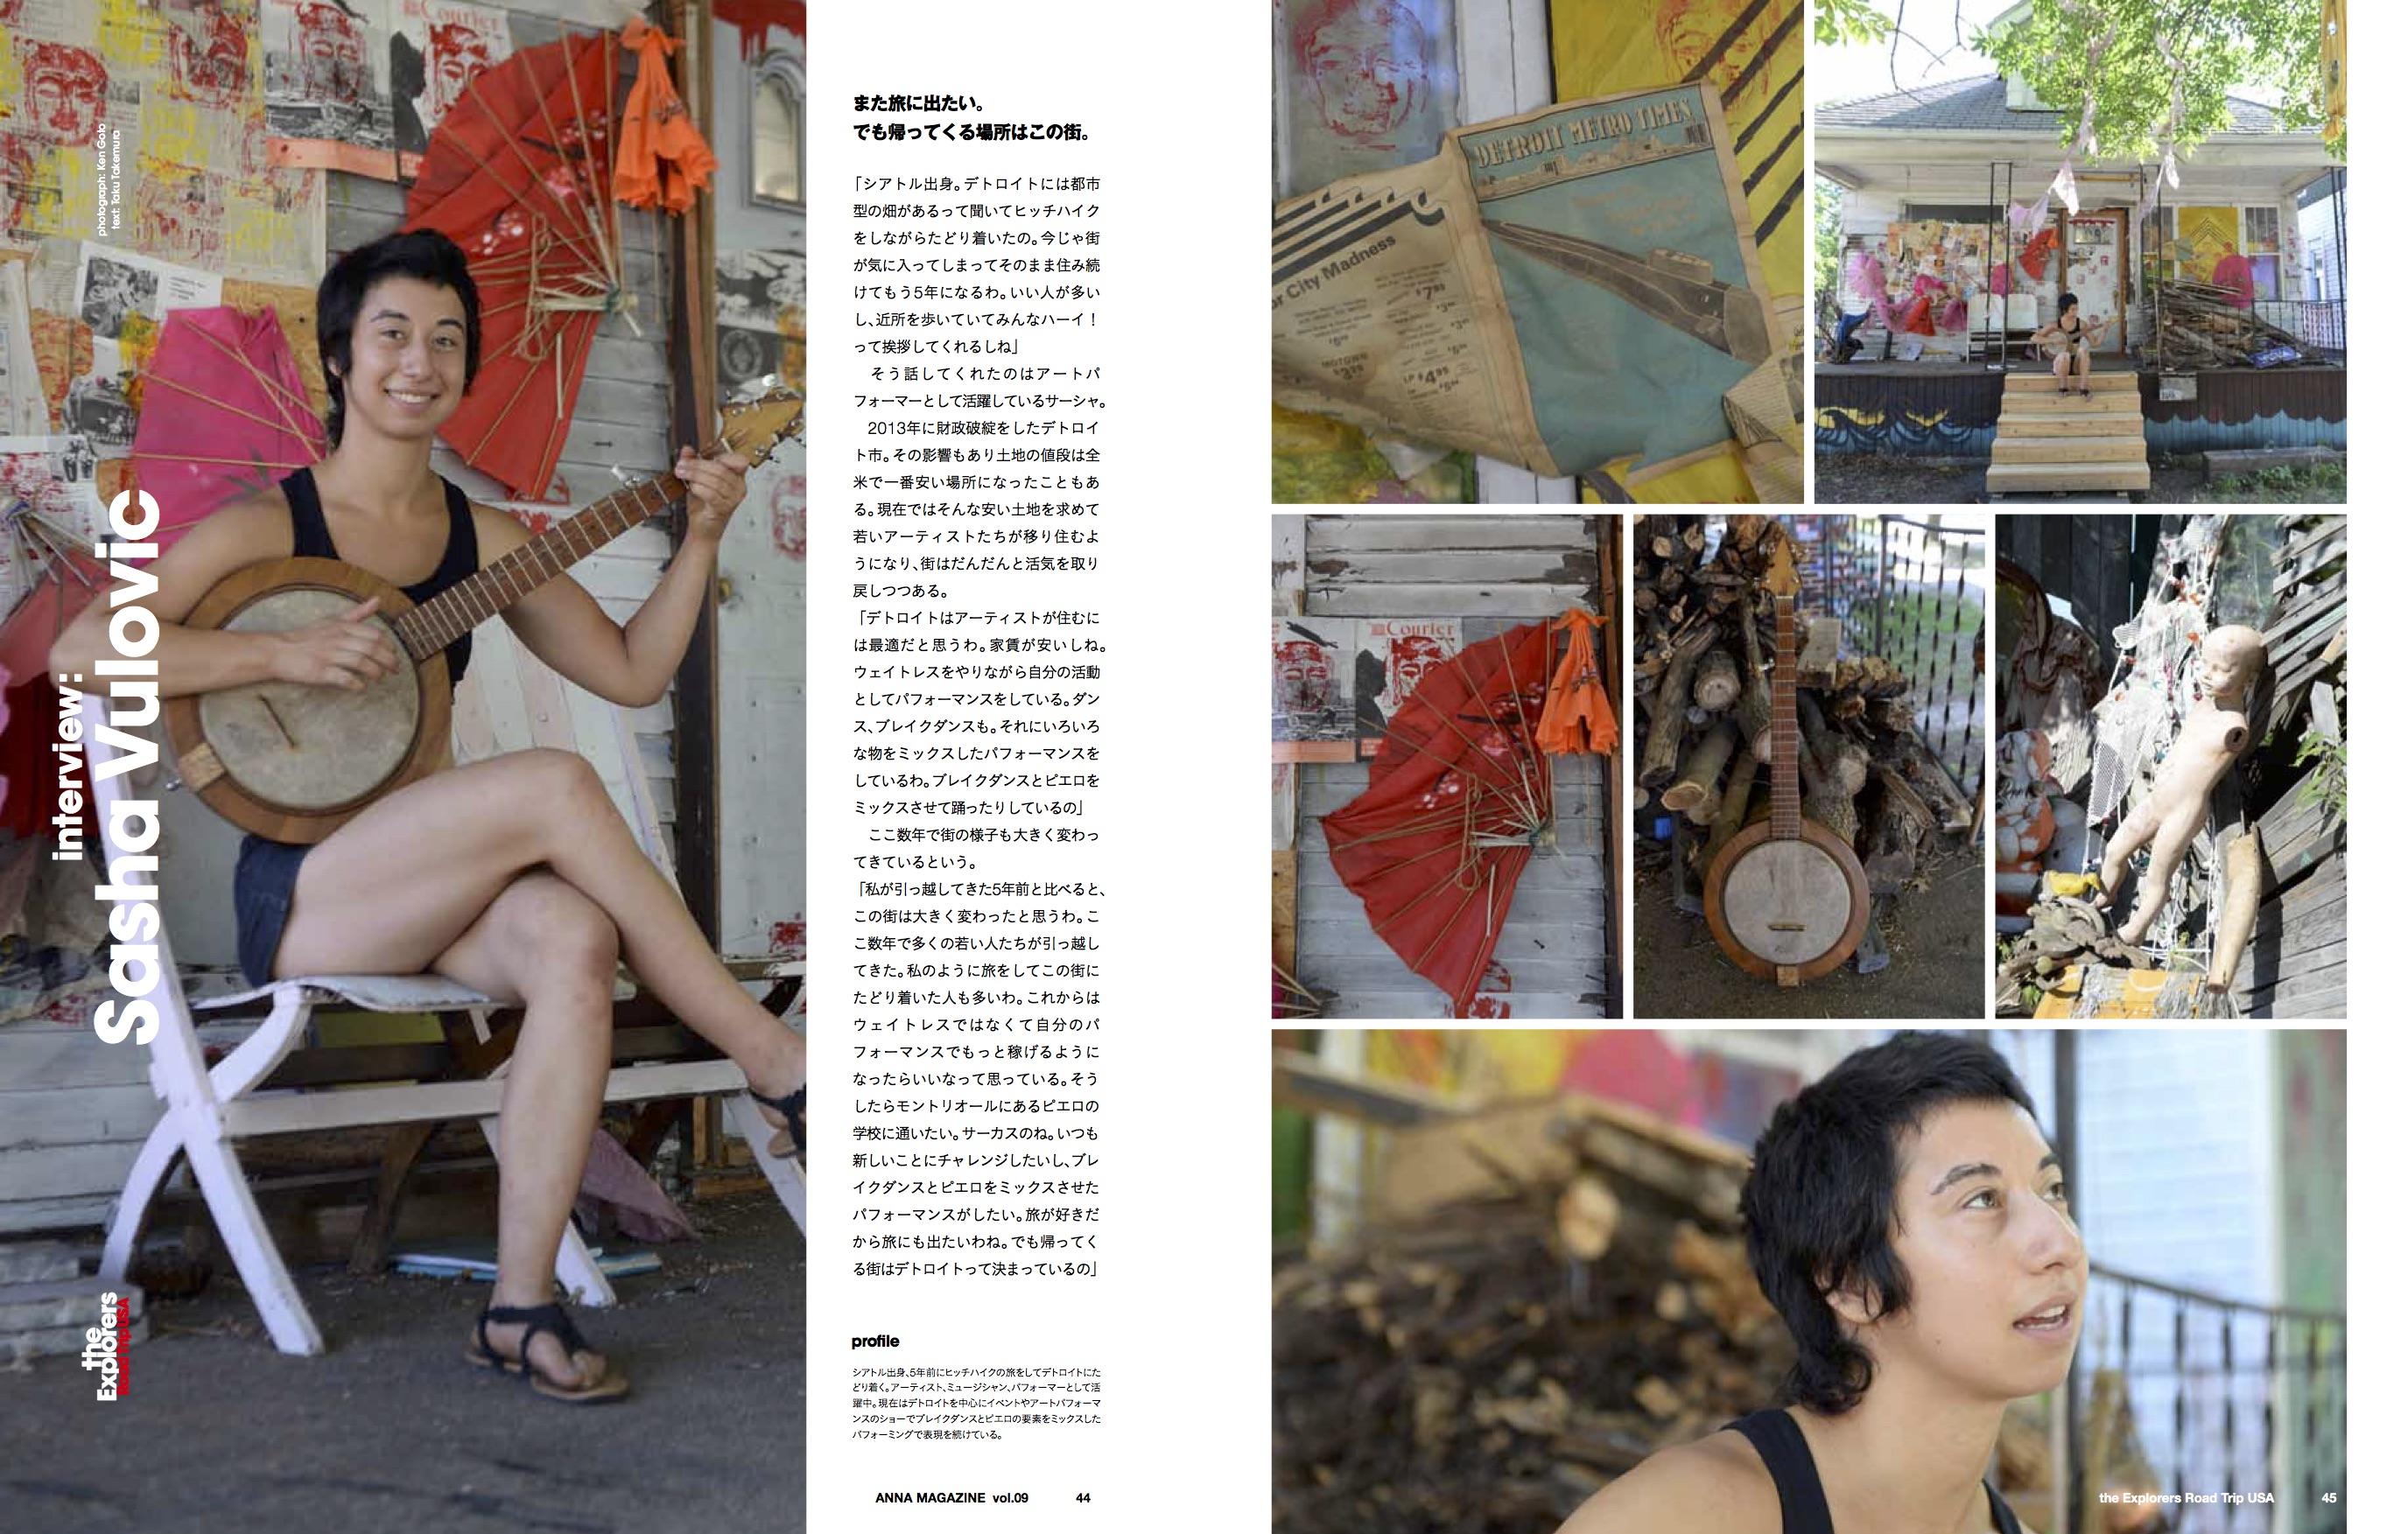 anna magazine vol.9 P22